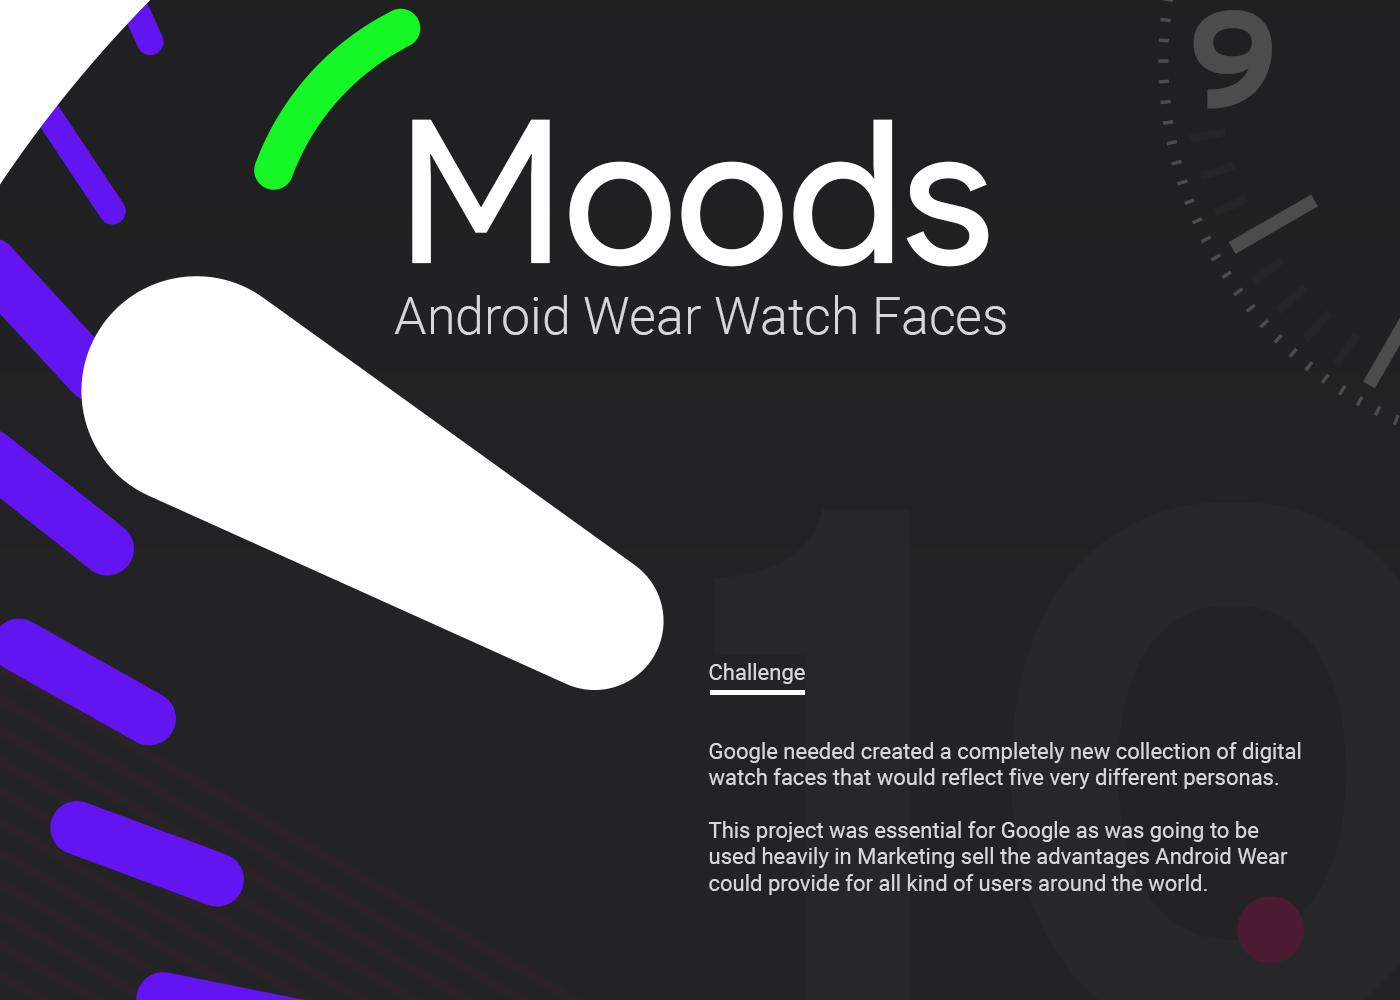 Moods product humt img 1